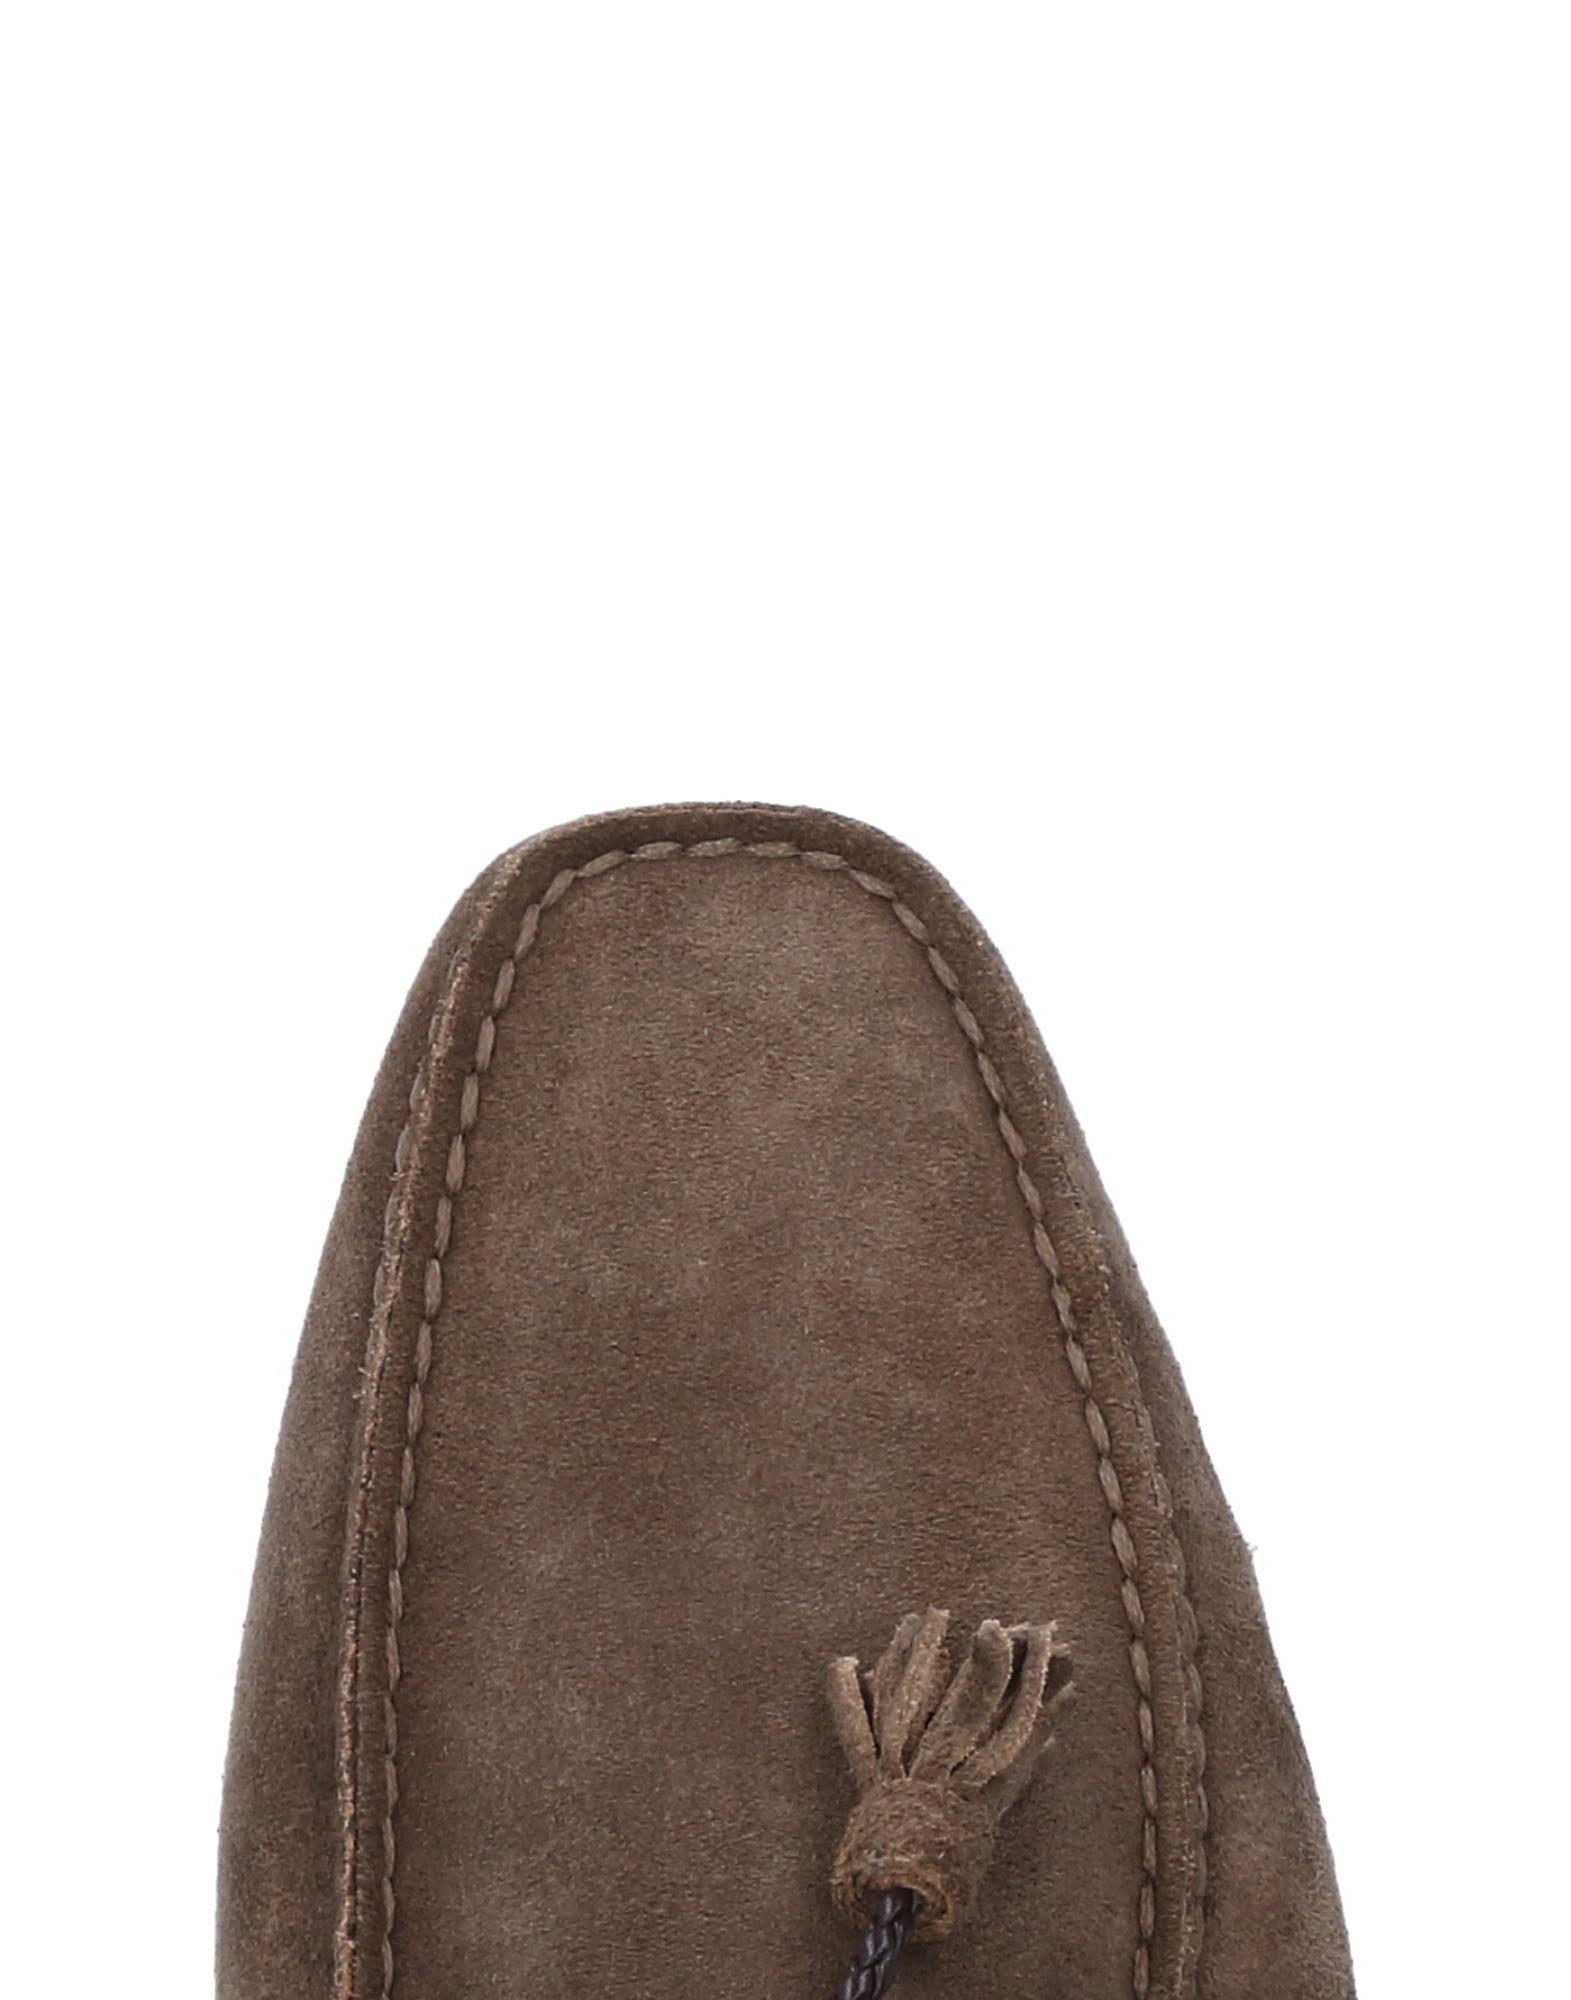 Santoni Mokassins Herren  11313735KB Gute Qualität beliebte Schuhe